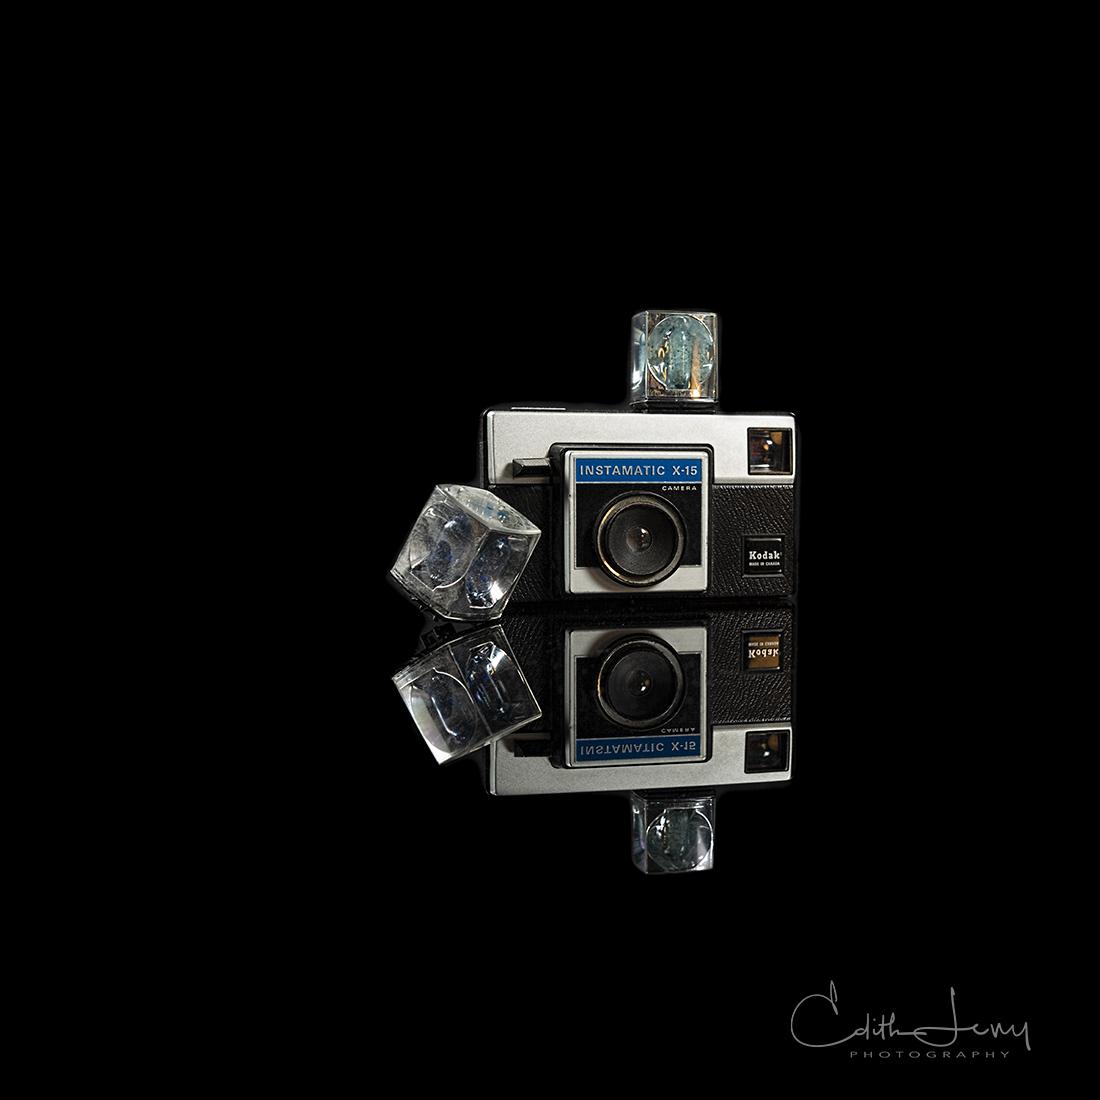 instamatic, x-15, classic camera, photo